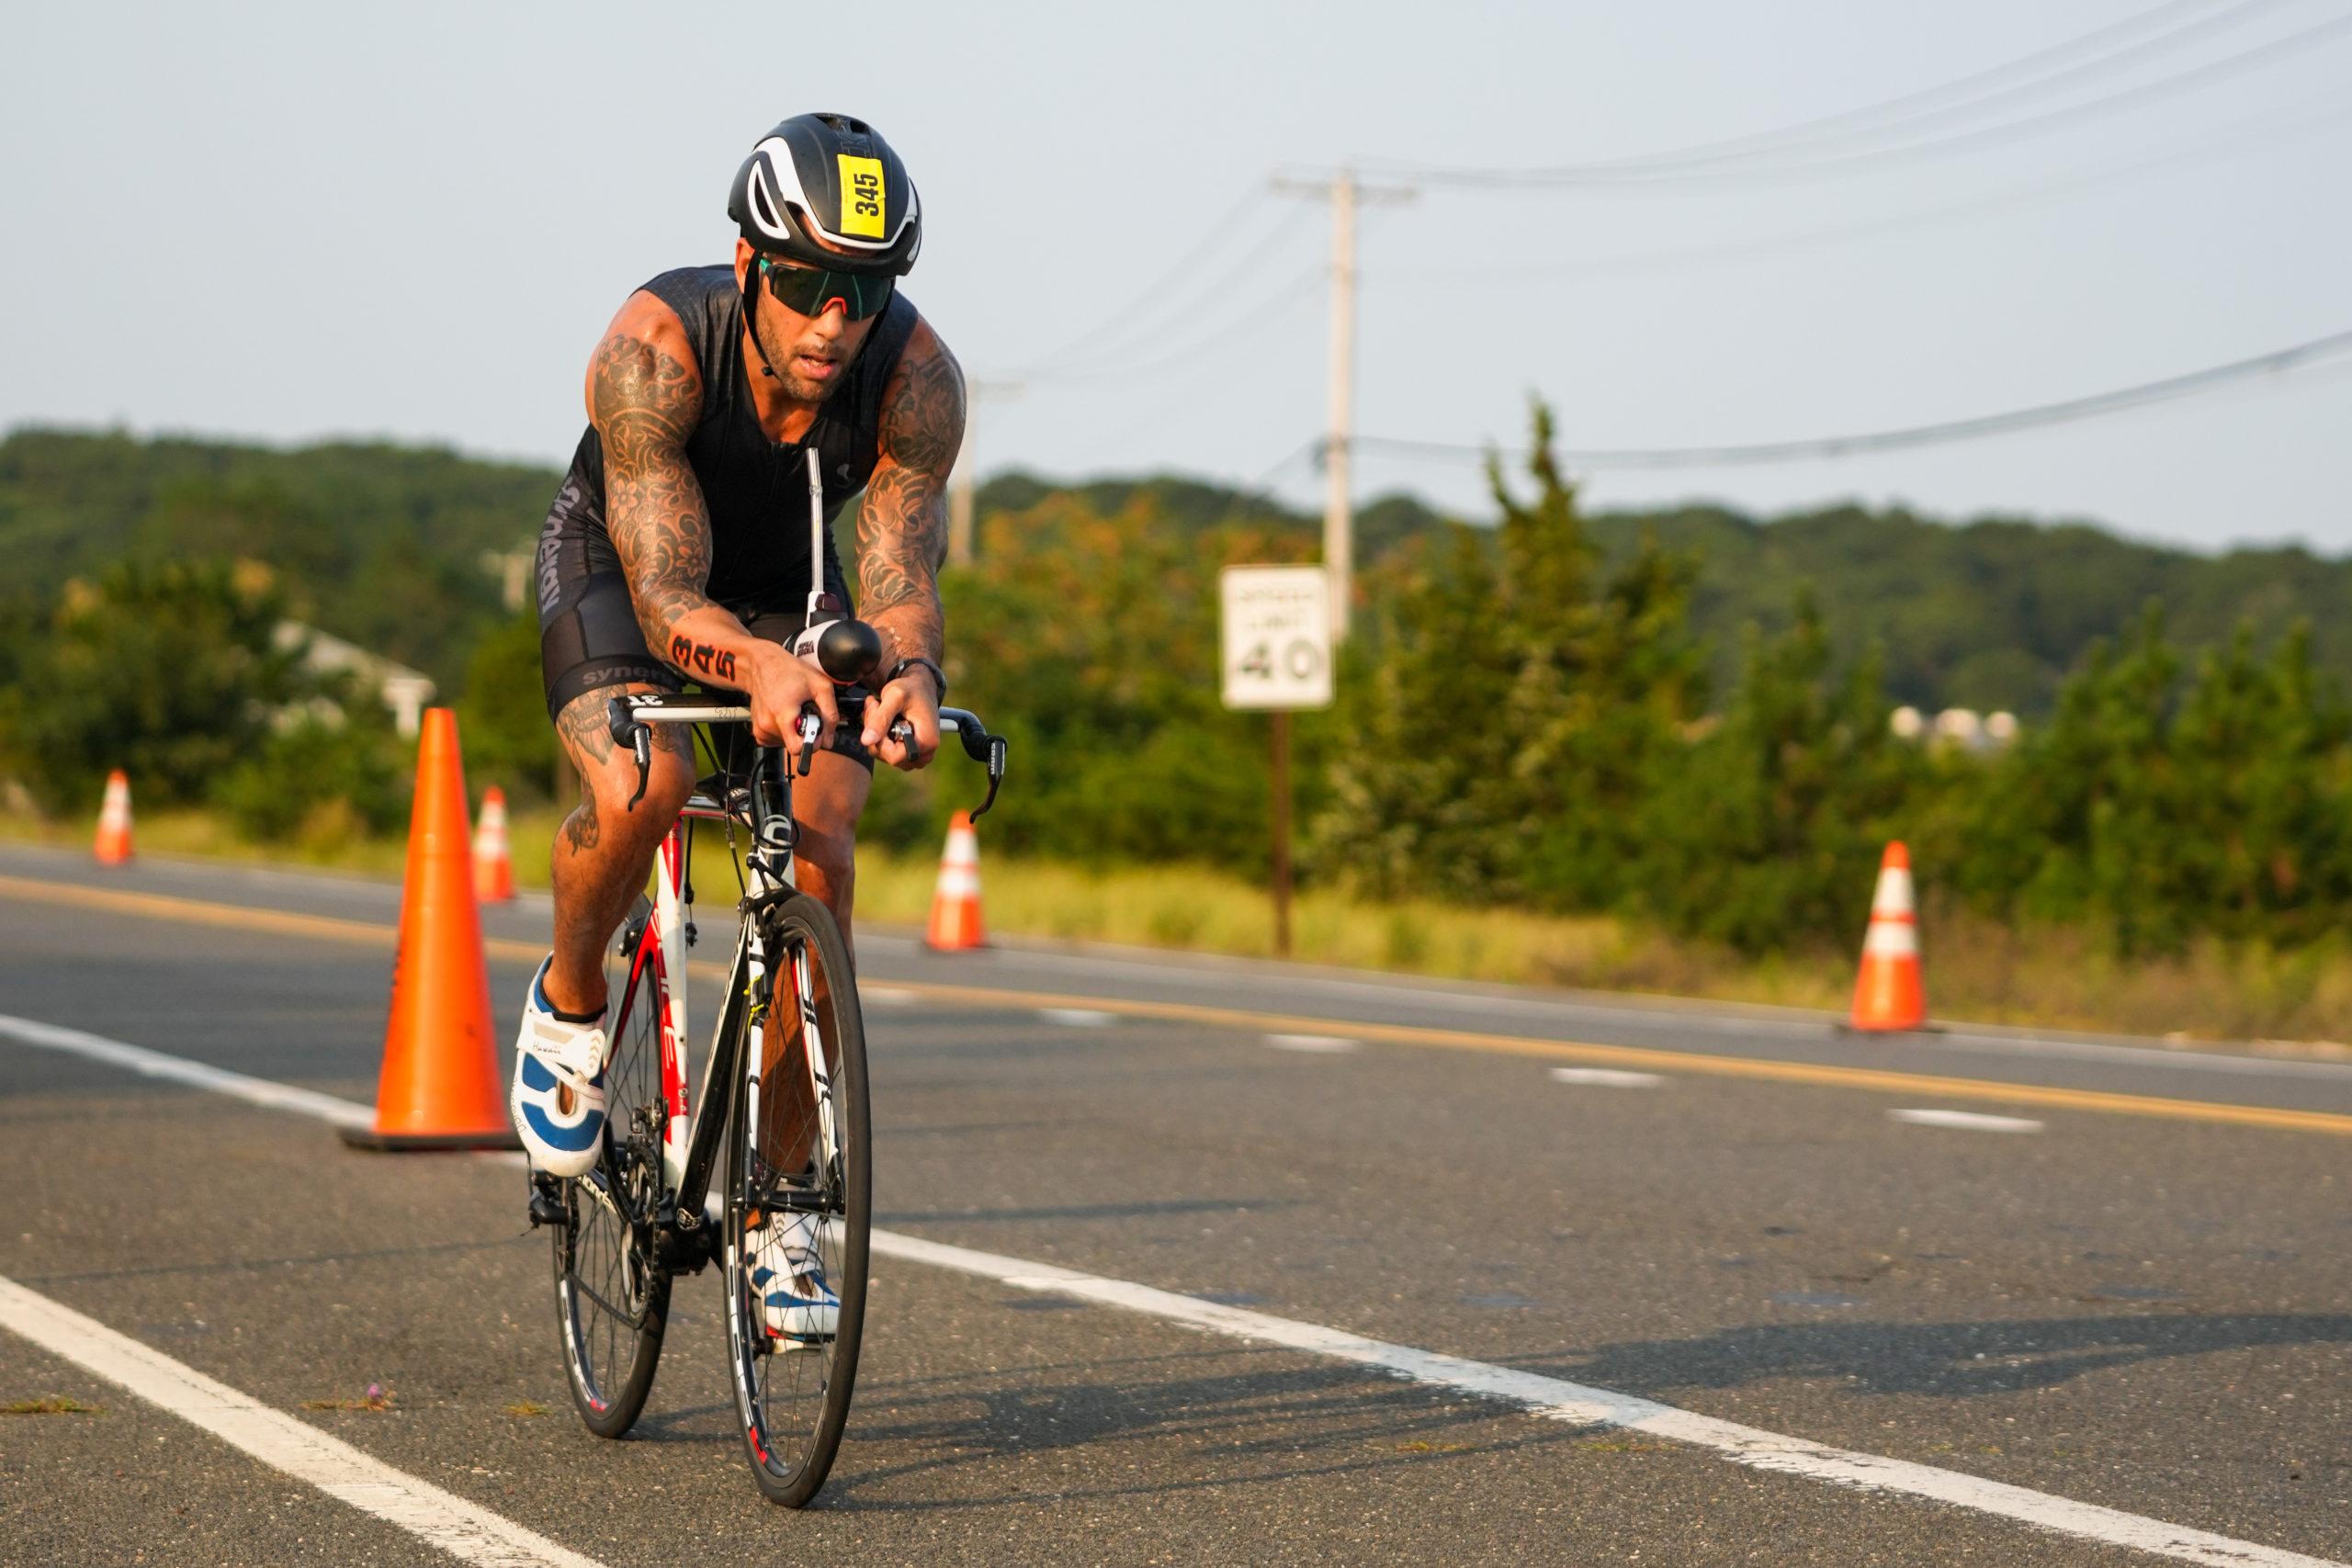 Neil Falkenhan in the bike portion of Sunday's race.